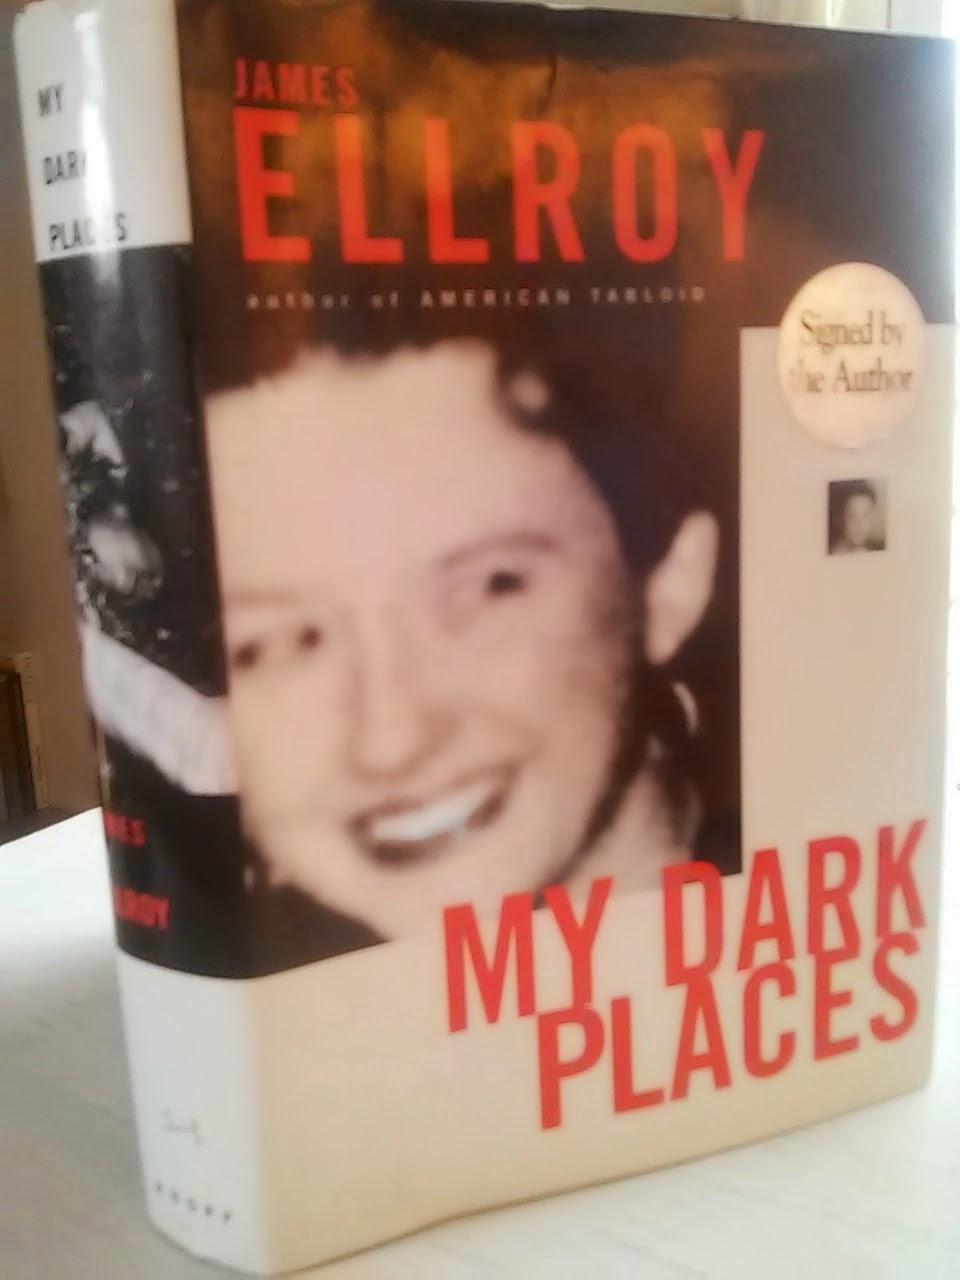 ellroy autographed.jpg